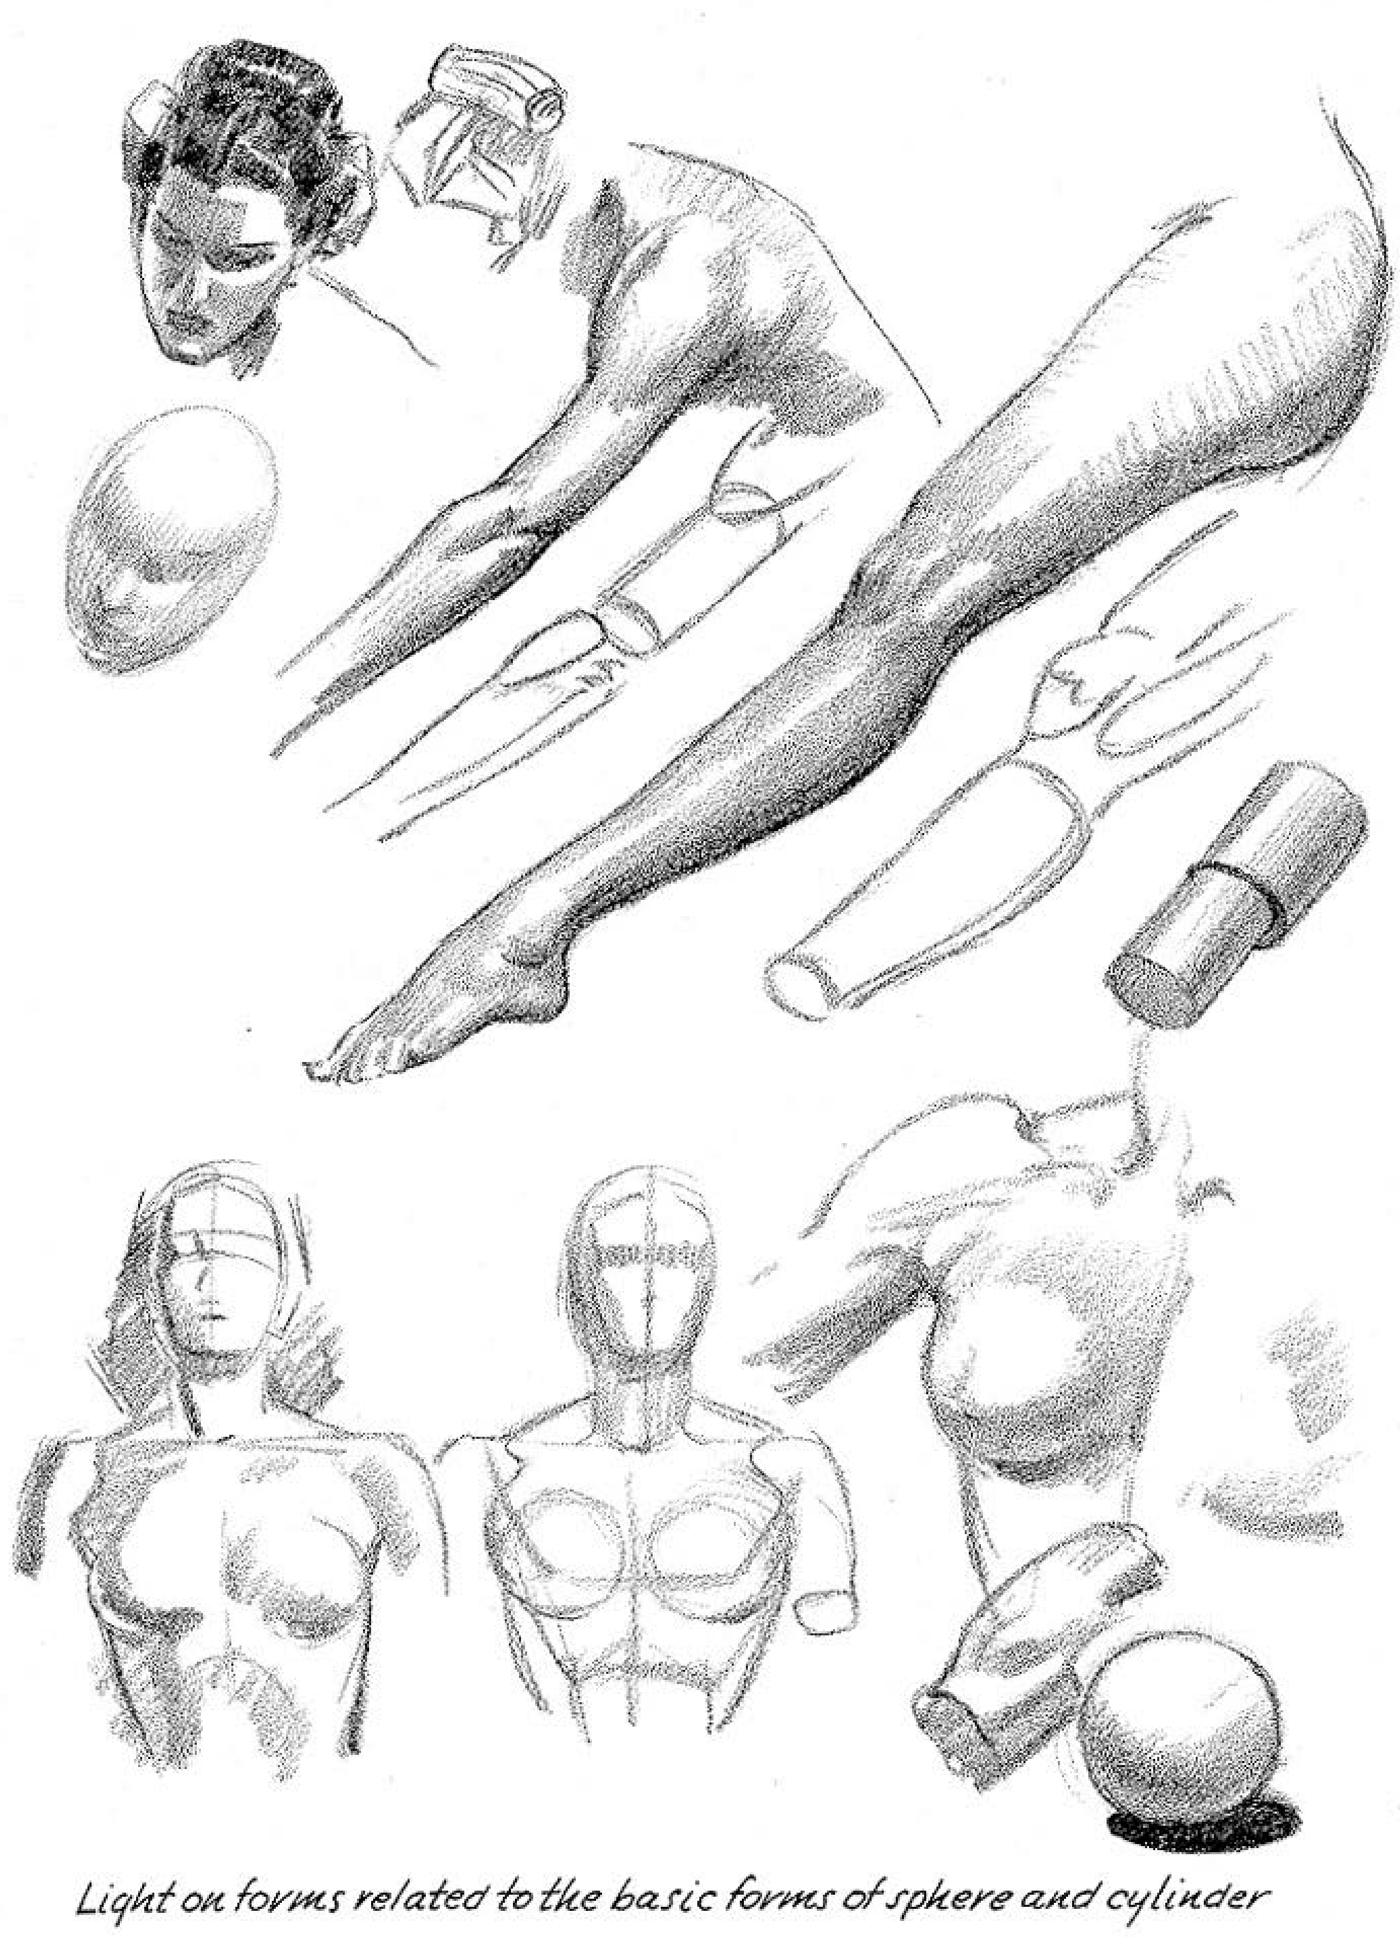 07-drawing-light-shadows-human-form-body.jpg